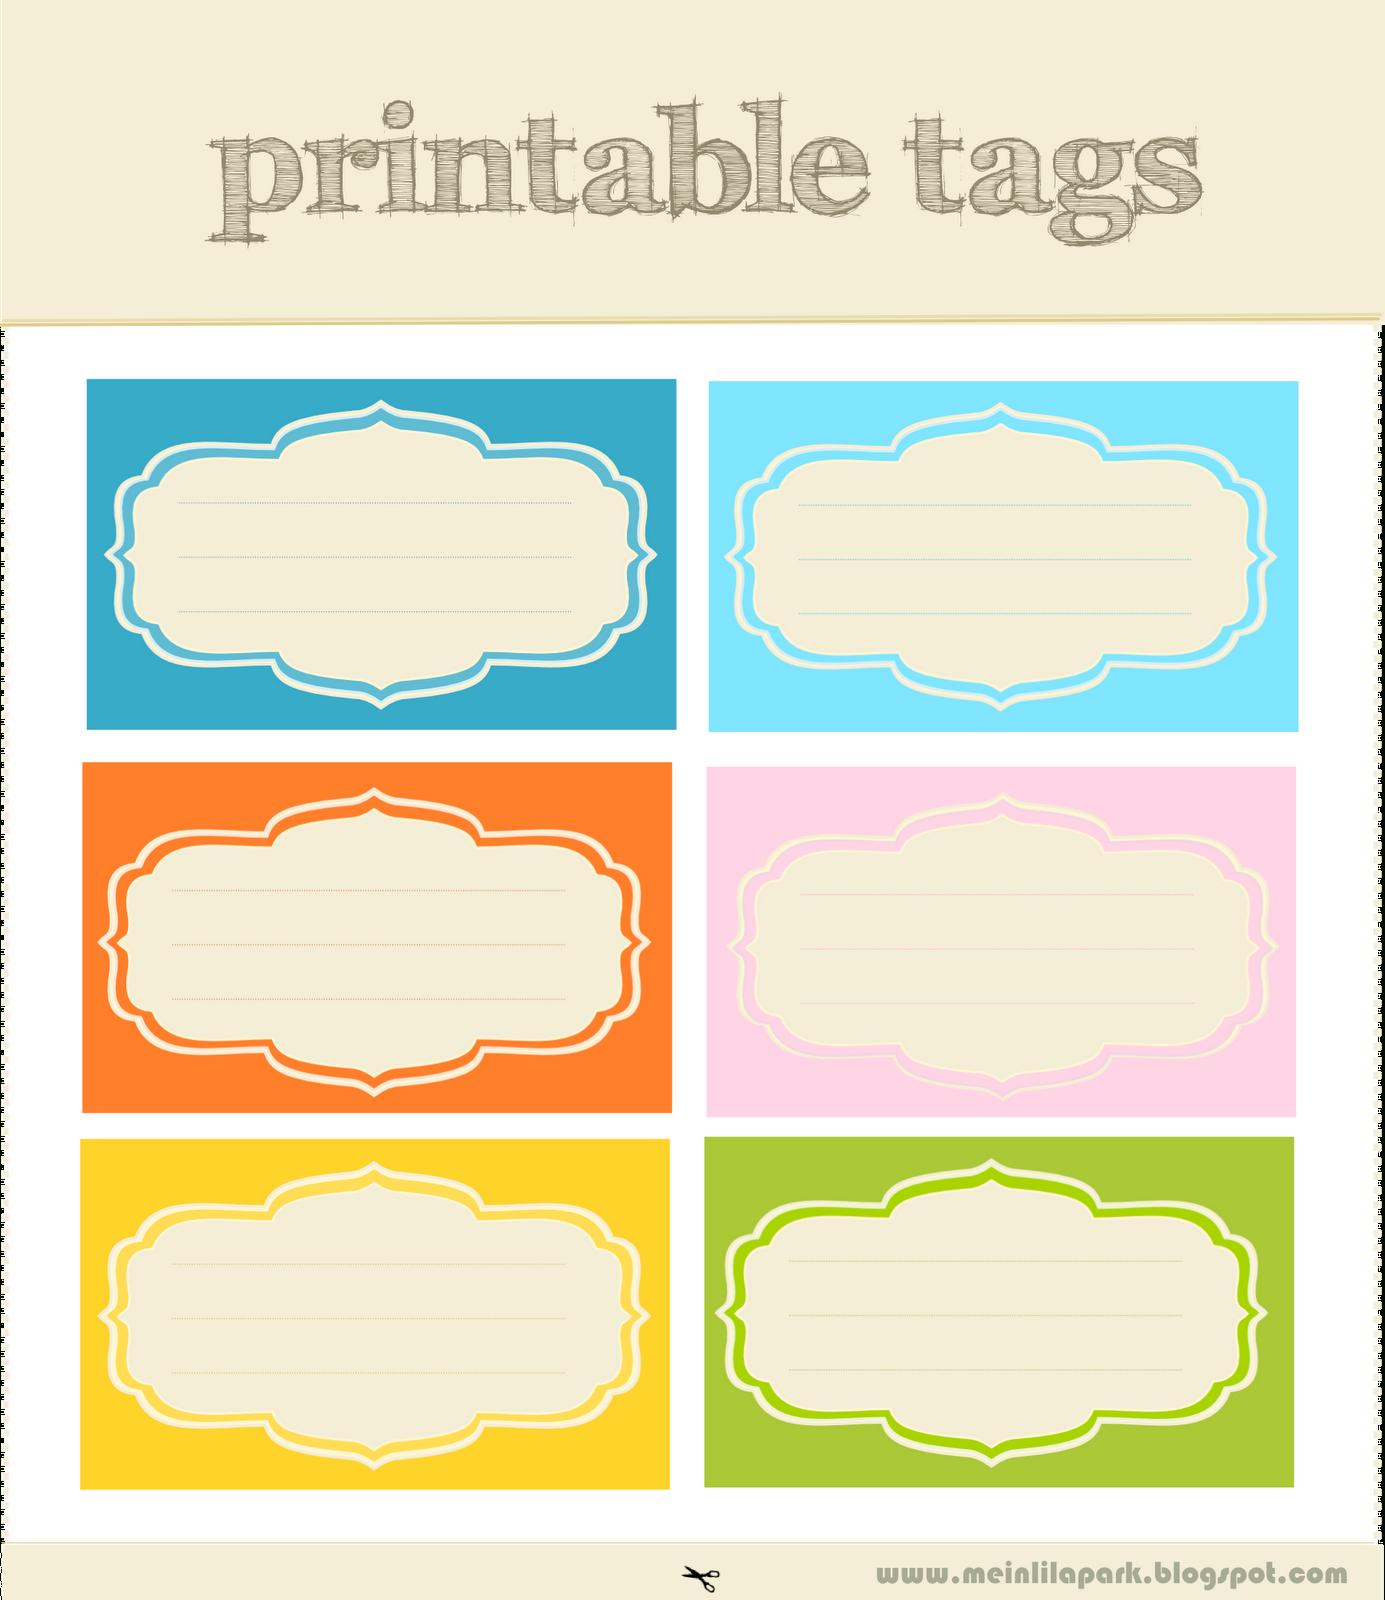 Free Printable Scrapbooking Tags And Digital Journaling Tags - Free Printable Tags